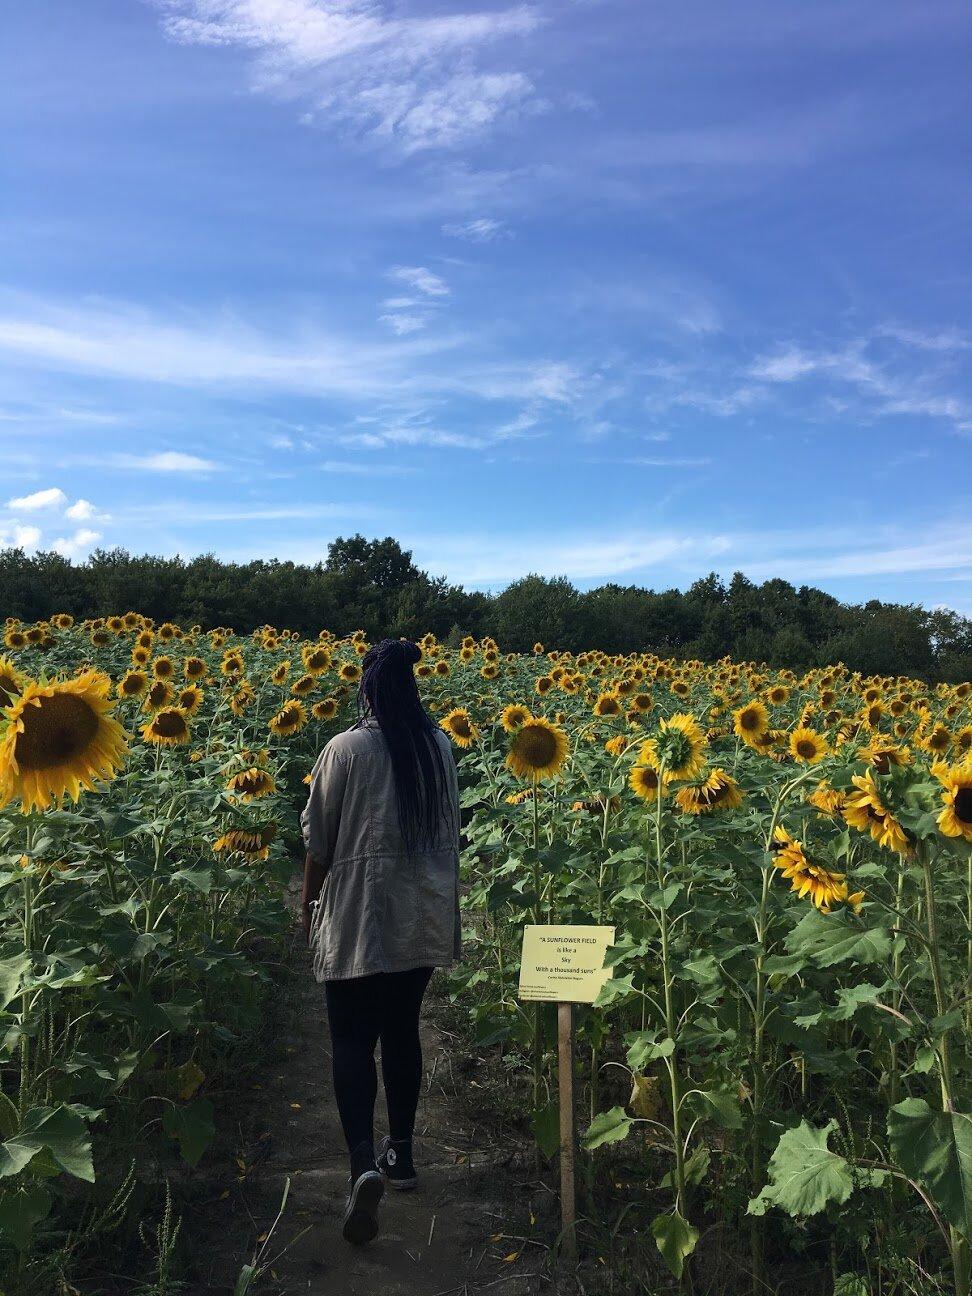 Aisha in the sunflower field